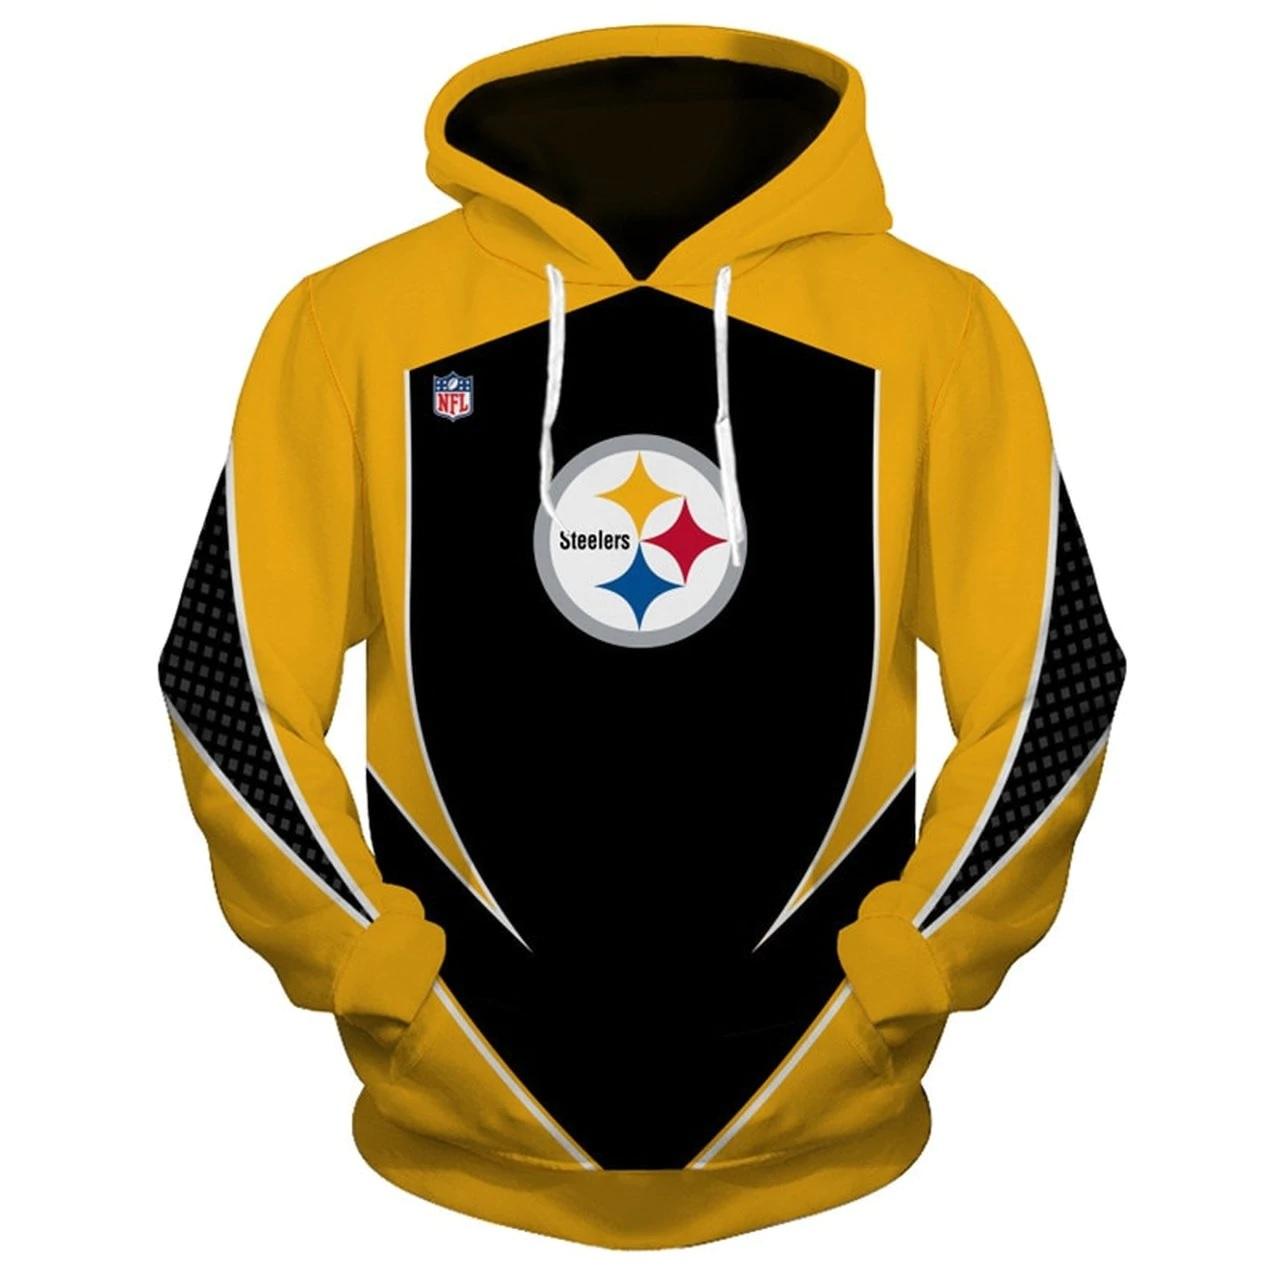 NFL pittsburgh steelers all over print hoodie